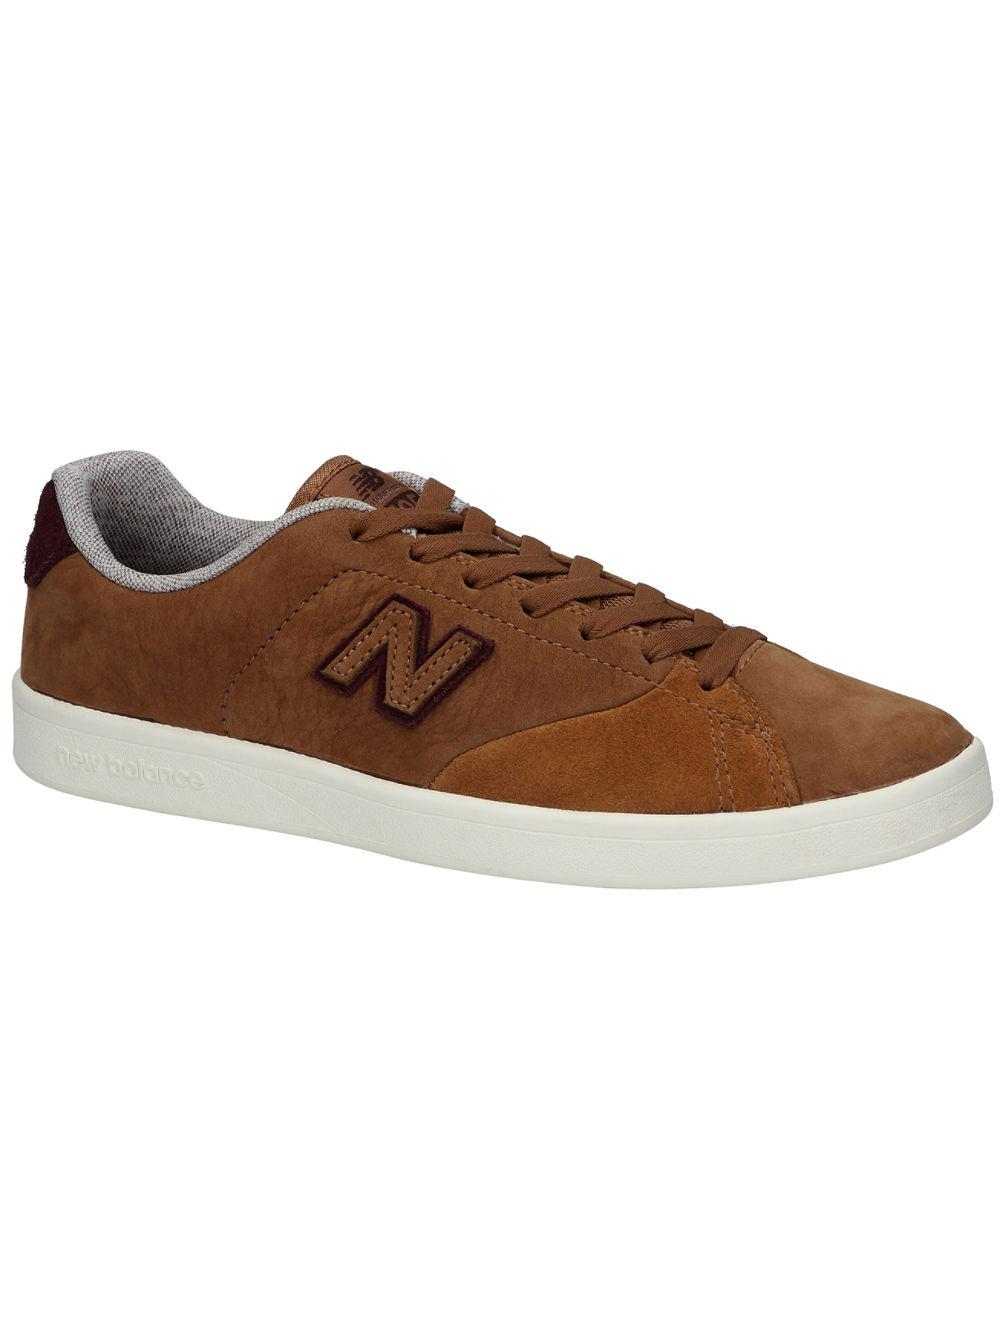 watch 13460 0d655 505 Numeric Skate Shoes